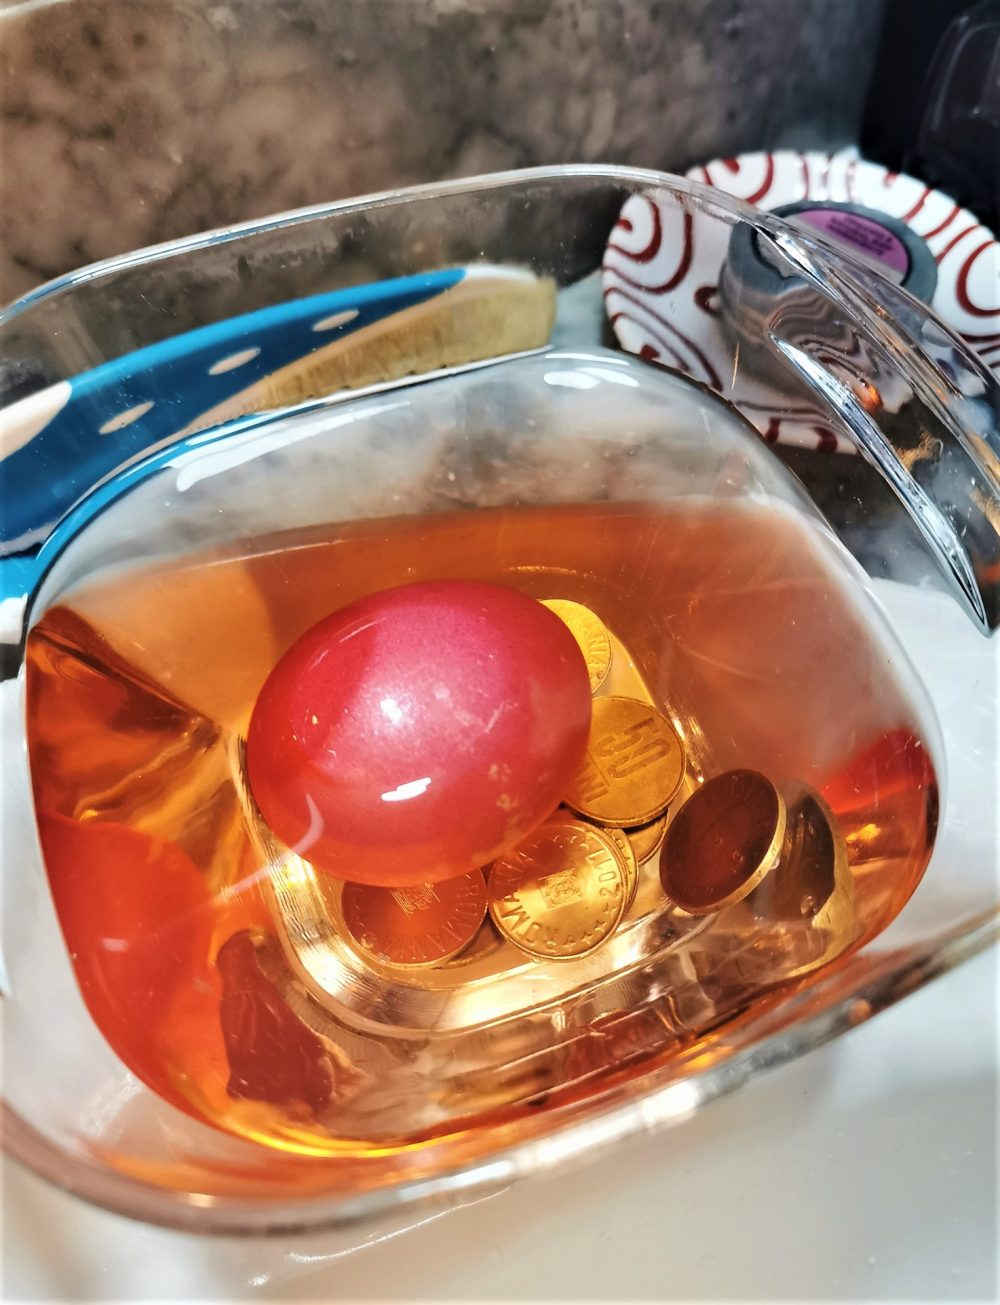 traditie paste ou rosu bani spalat fata